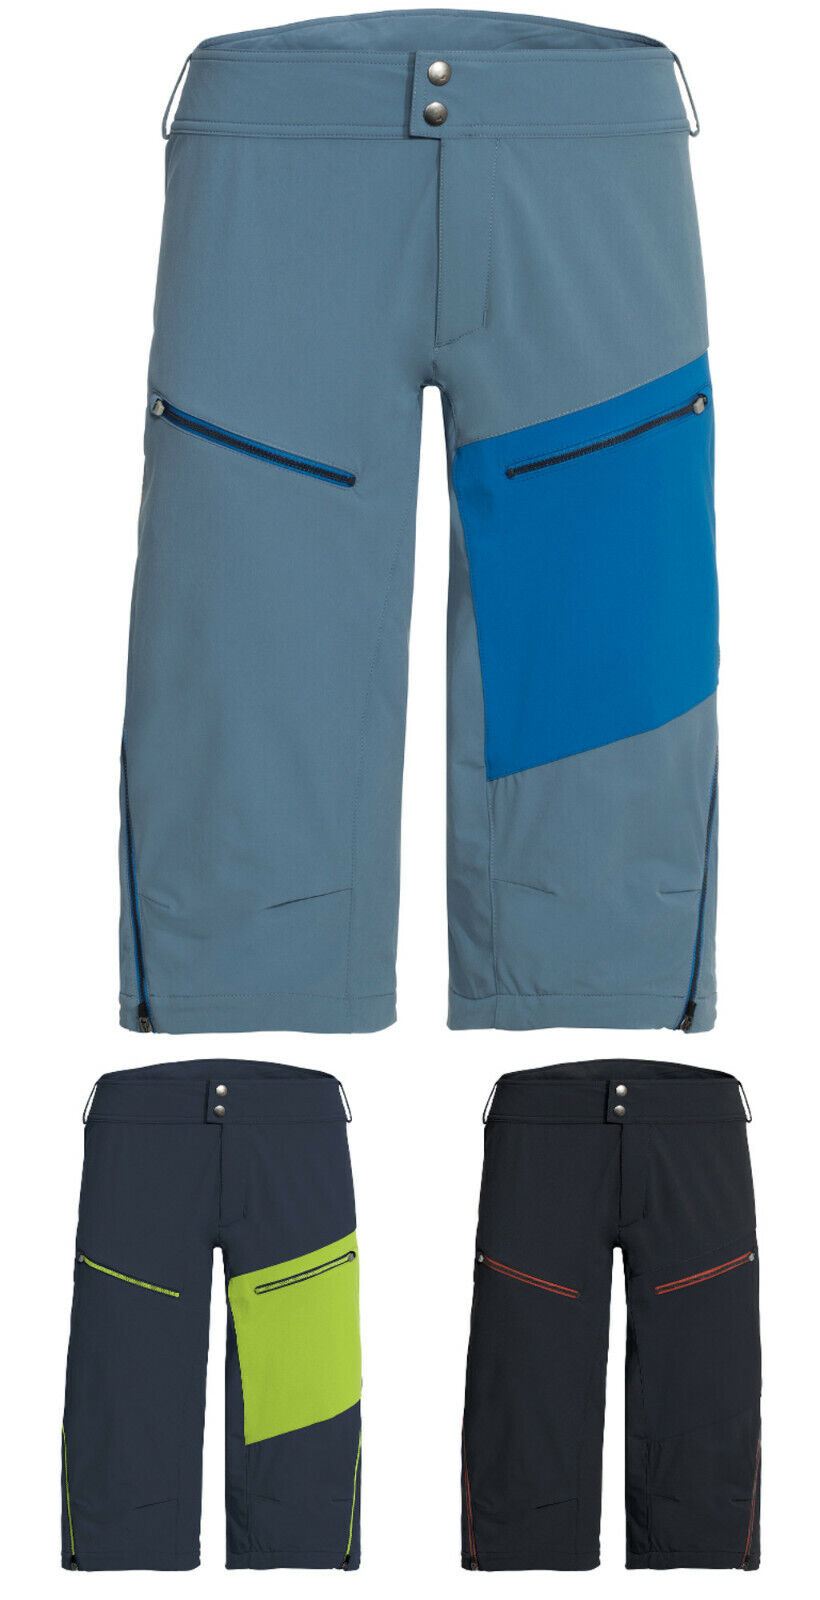 Vaude enduro shorts De los hombres Moab shorts III  bicicleta pantalones señores bikeshorts Cycling culotte  tienda en linea